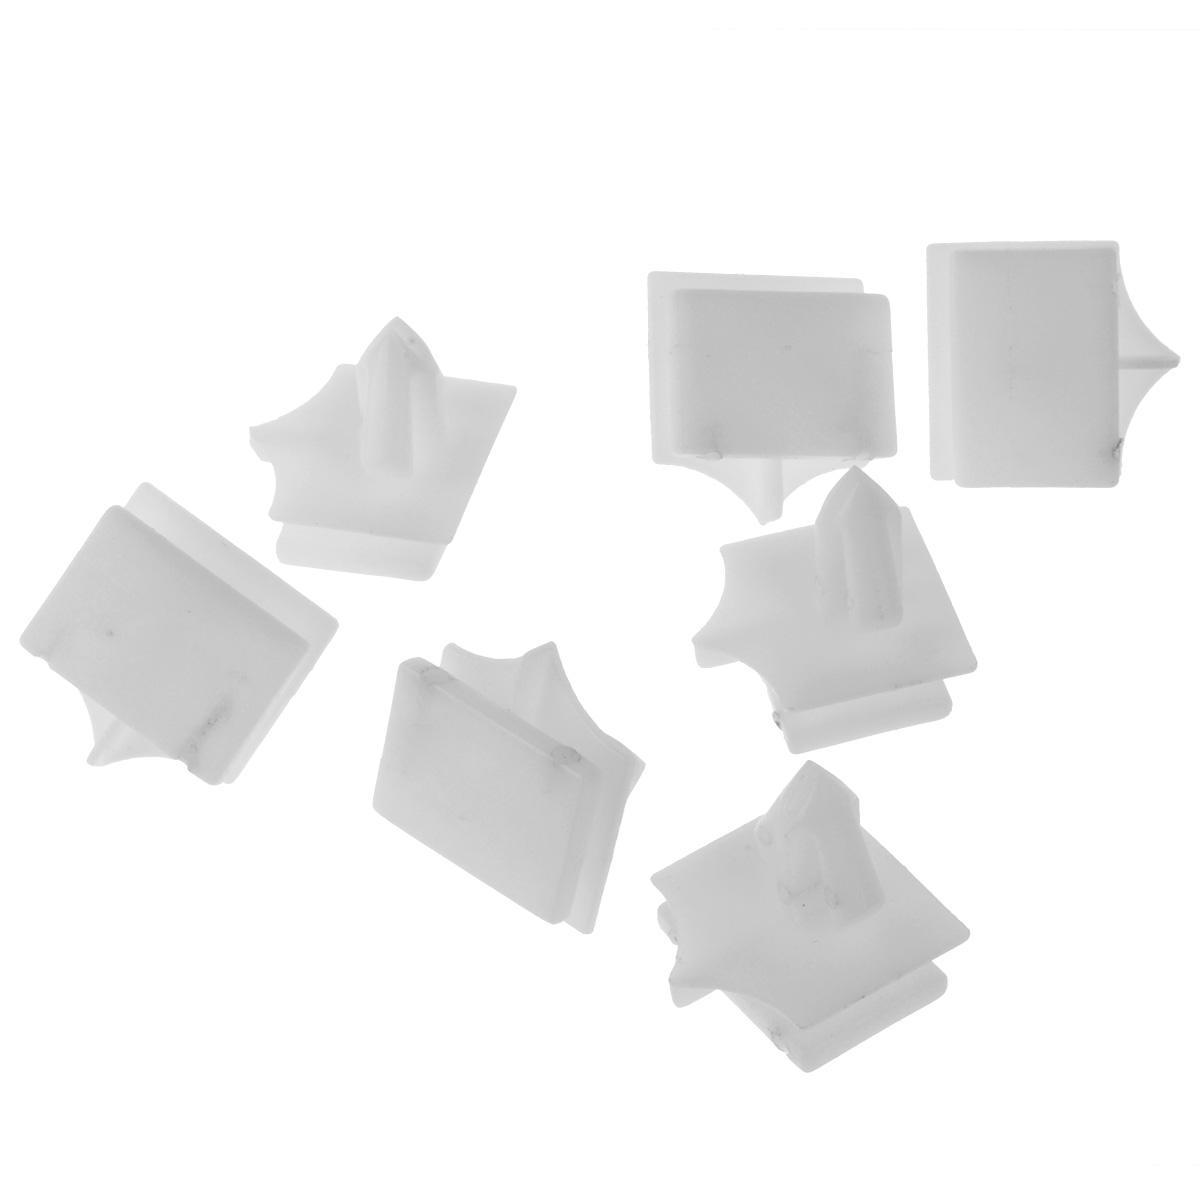 100pcs Rocker Panel Moulding Plastic Push Retainer Rivet for Chevrolet Avalanche